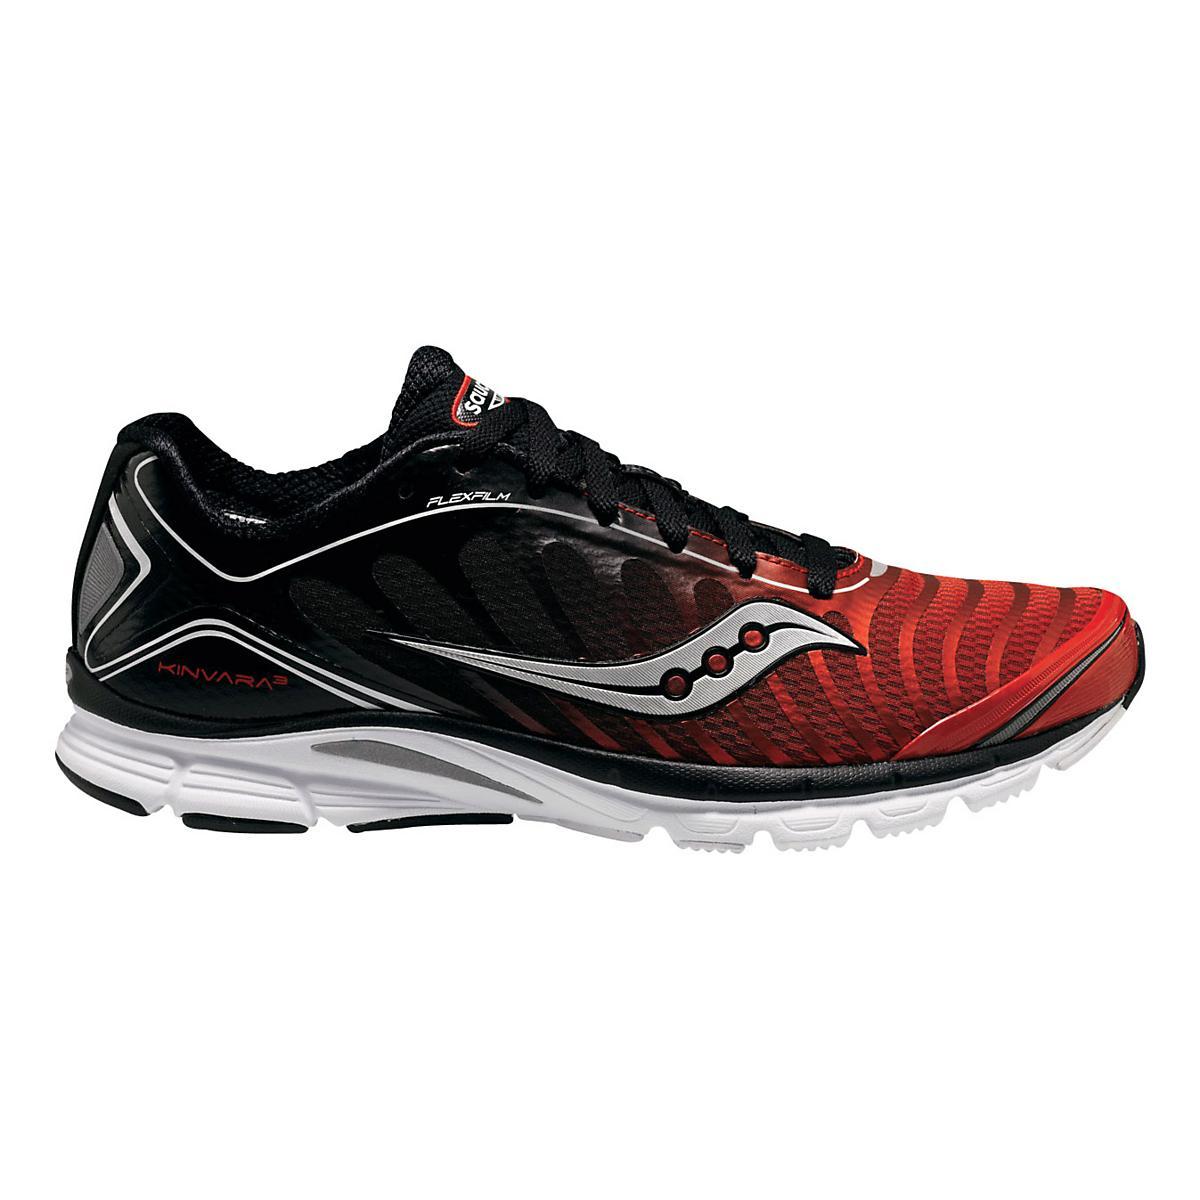 0d8e0ce5b875 Mens Saucony ProGrid Kinvara 3 Running Shoe at Road Runner Sports